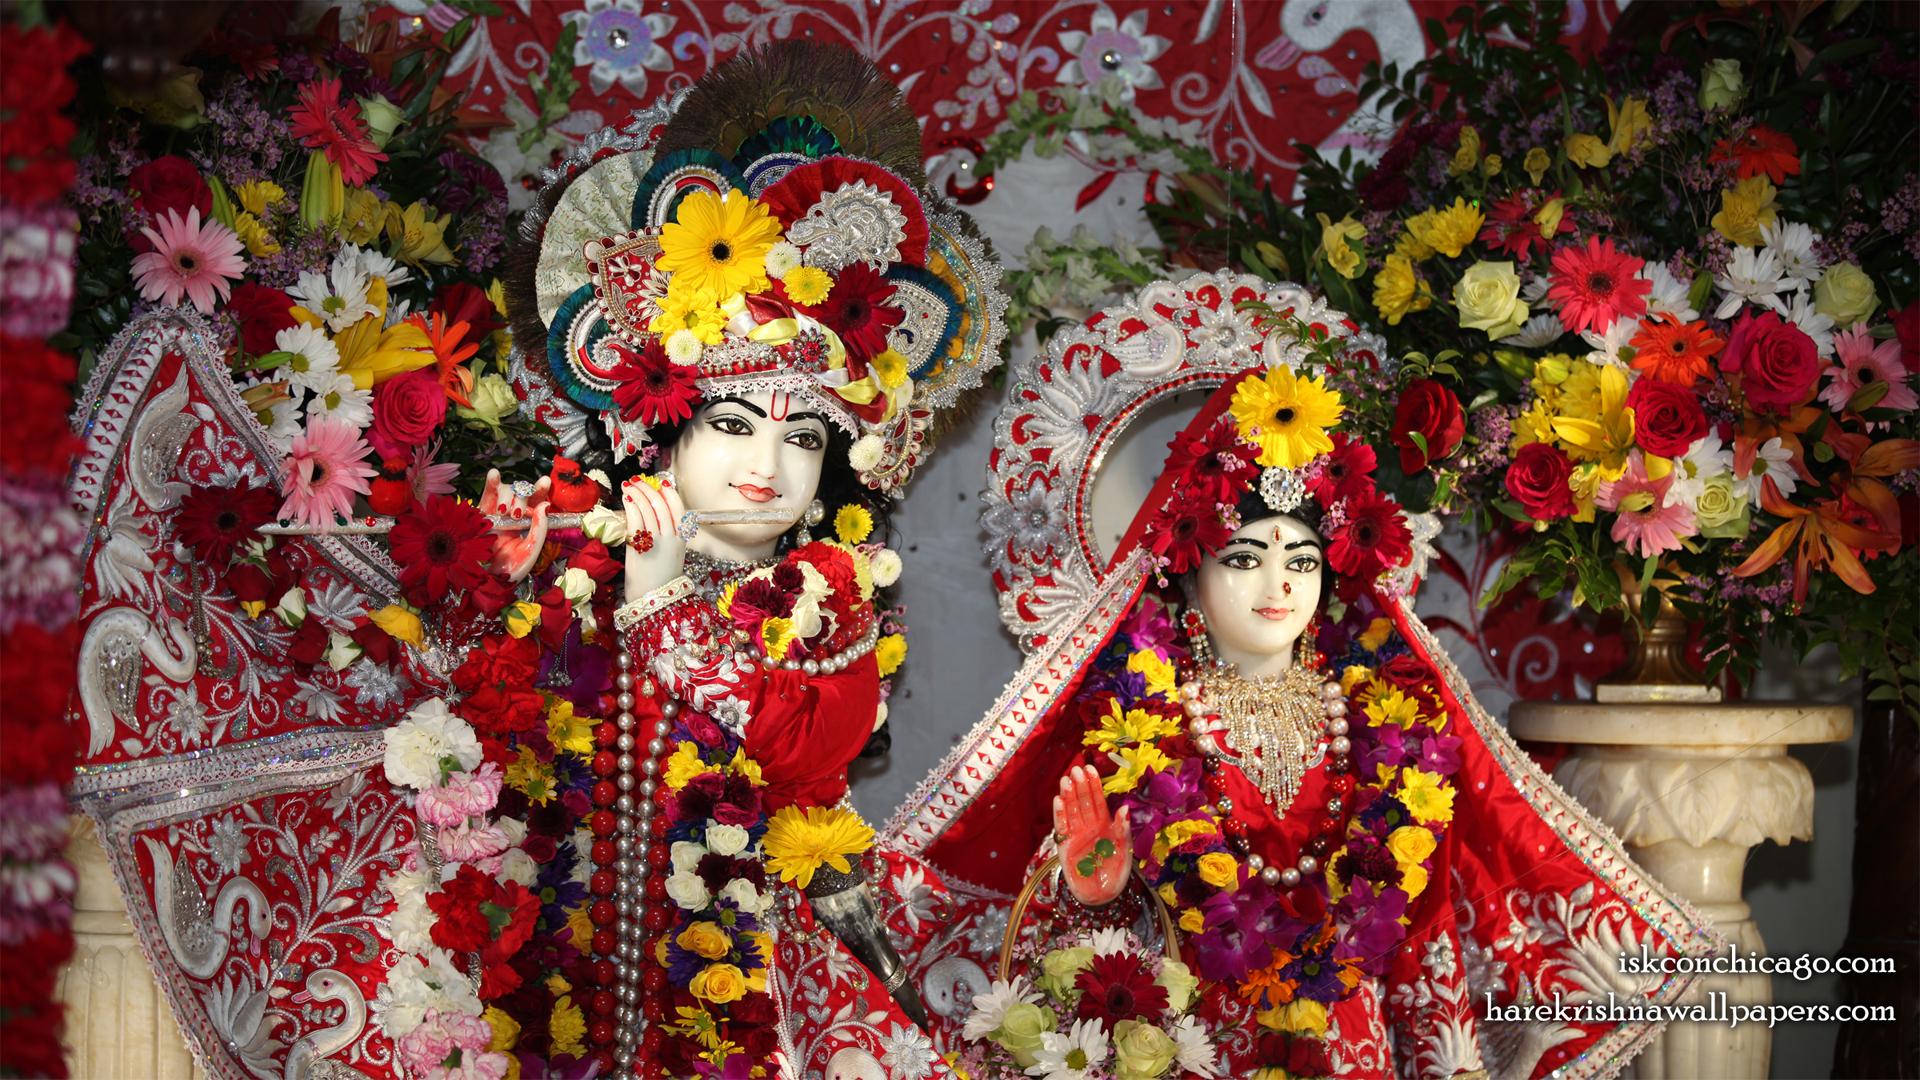 Sri Sri Kishore Kishori Close up Wallpaper (013) Size 1920x1080 Download